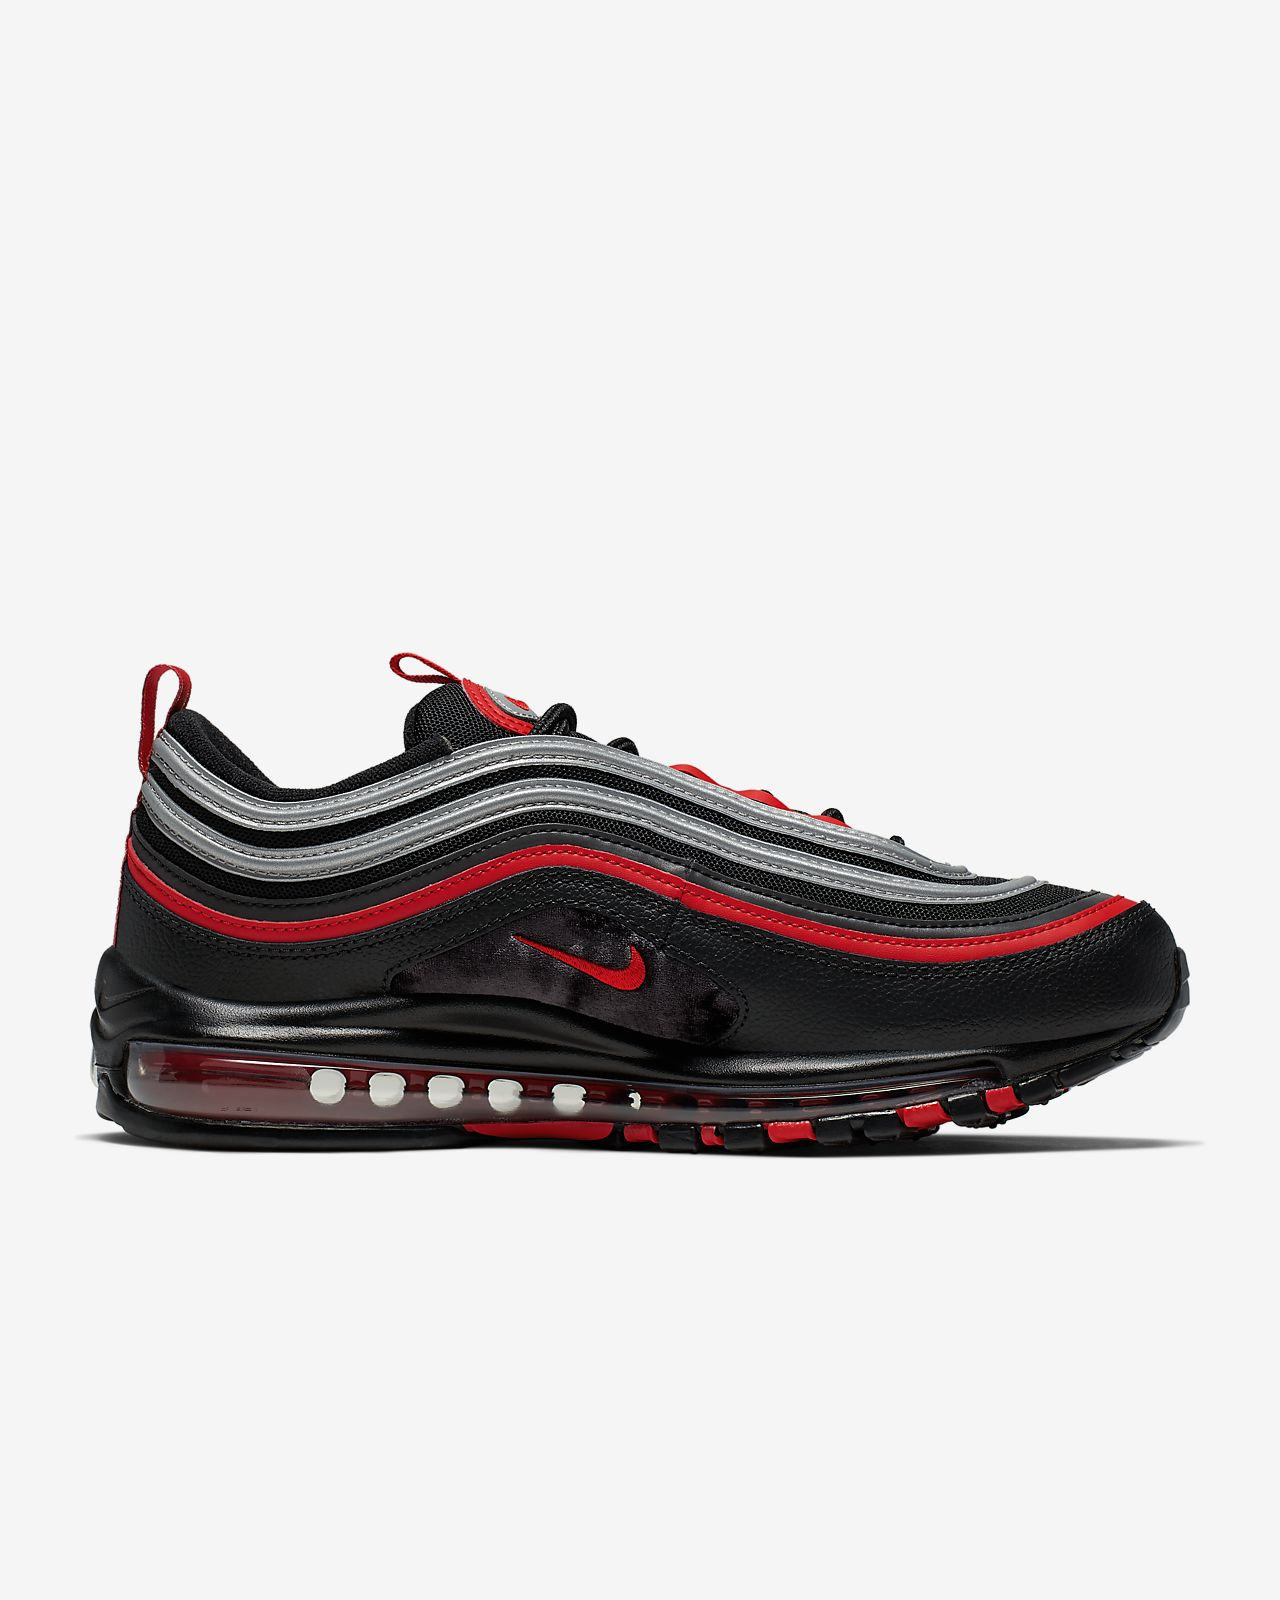 Sorte 97 sneakers fra Nike Air Max 921826 008